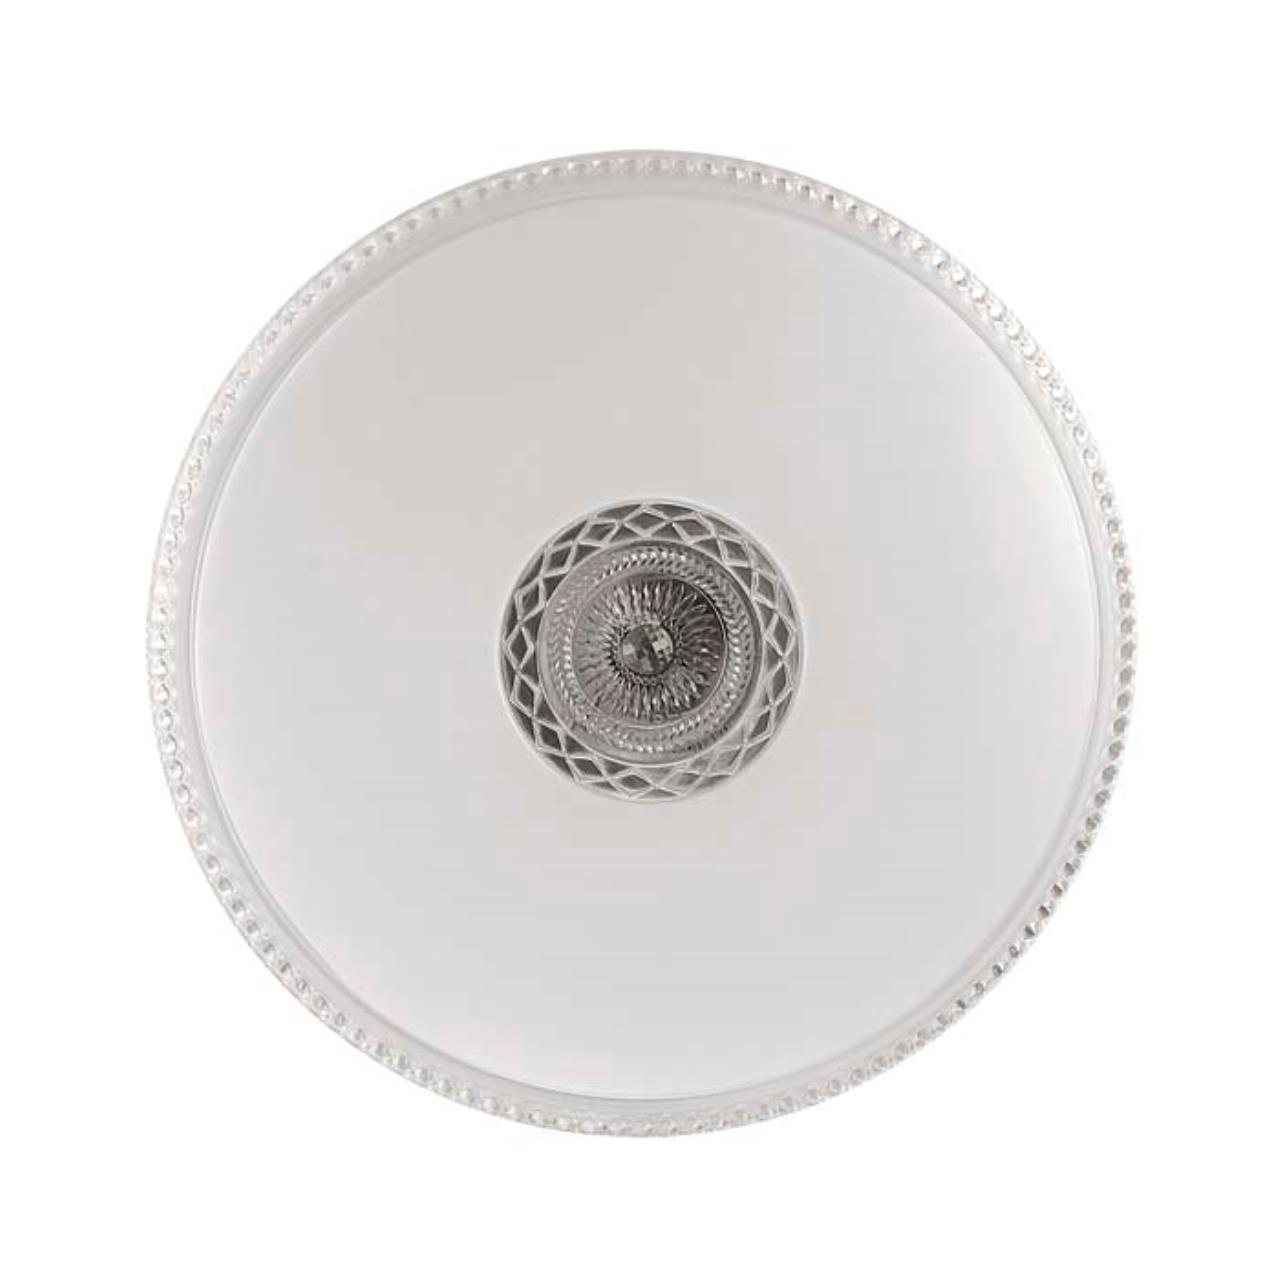 2044/EL SN 085 св-к LAVORA пластик LED 72Вт 3000-6000K D480 IP43 пульт ДУ